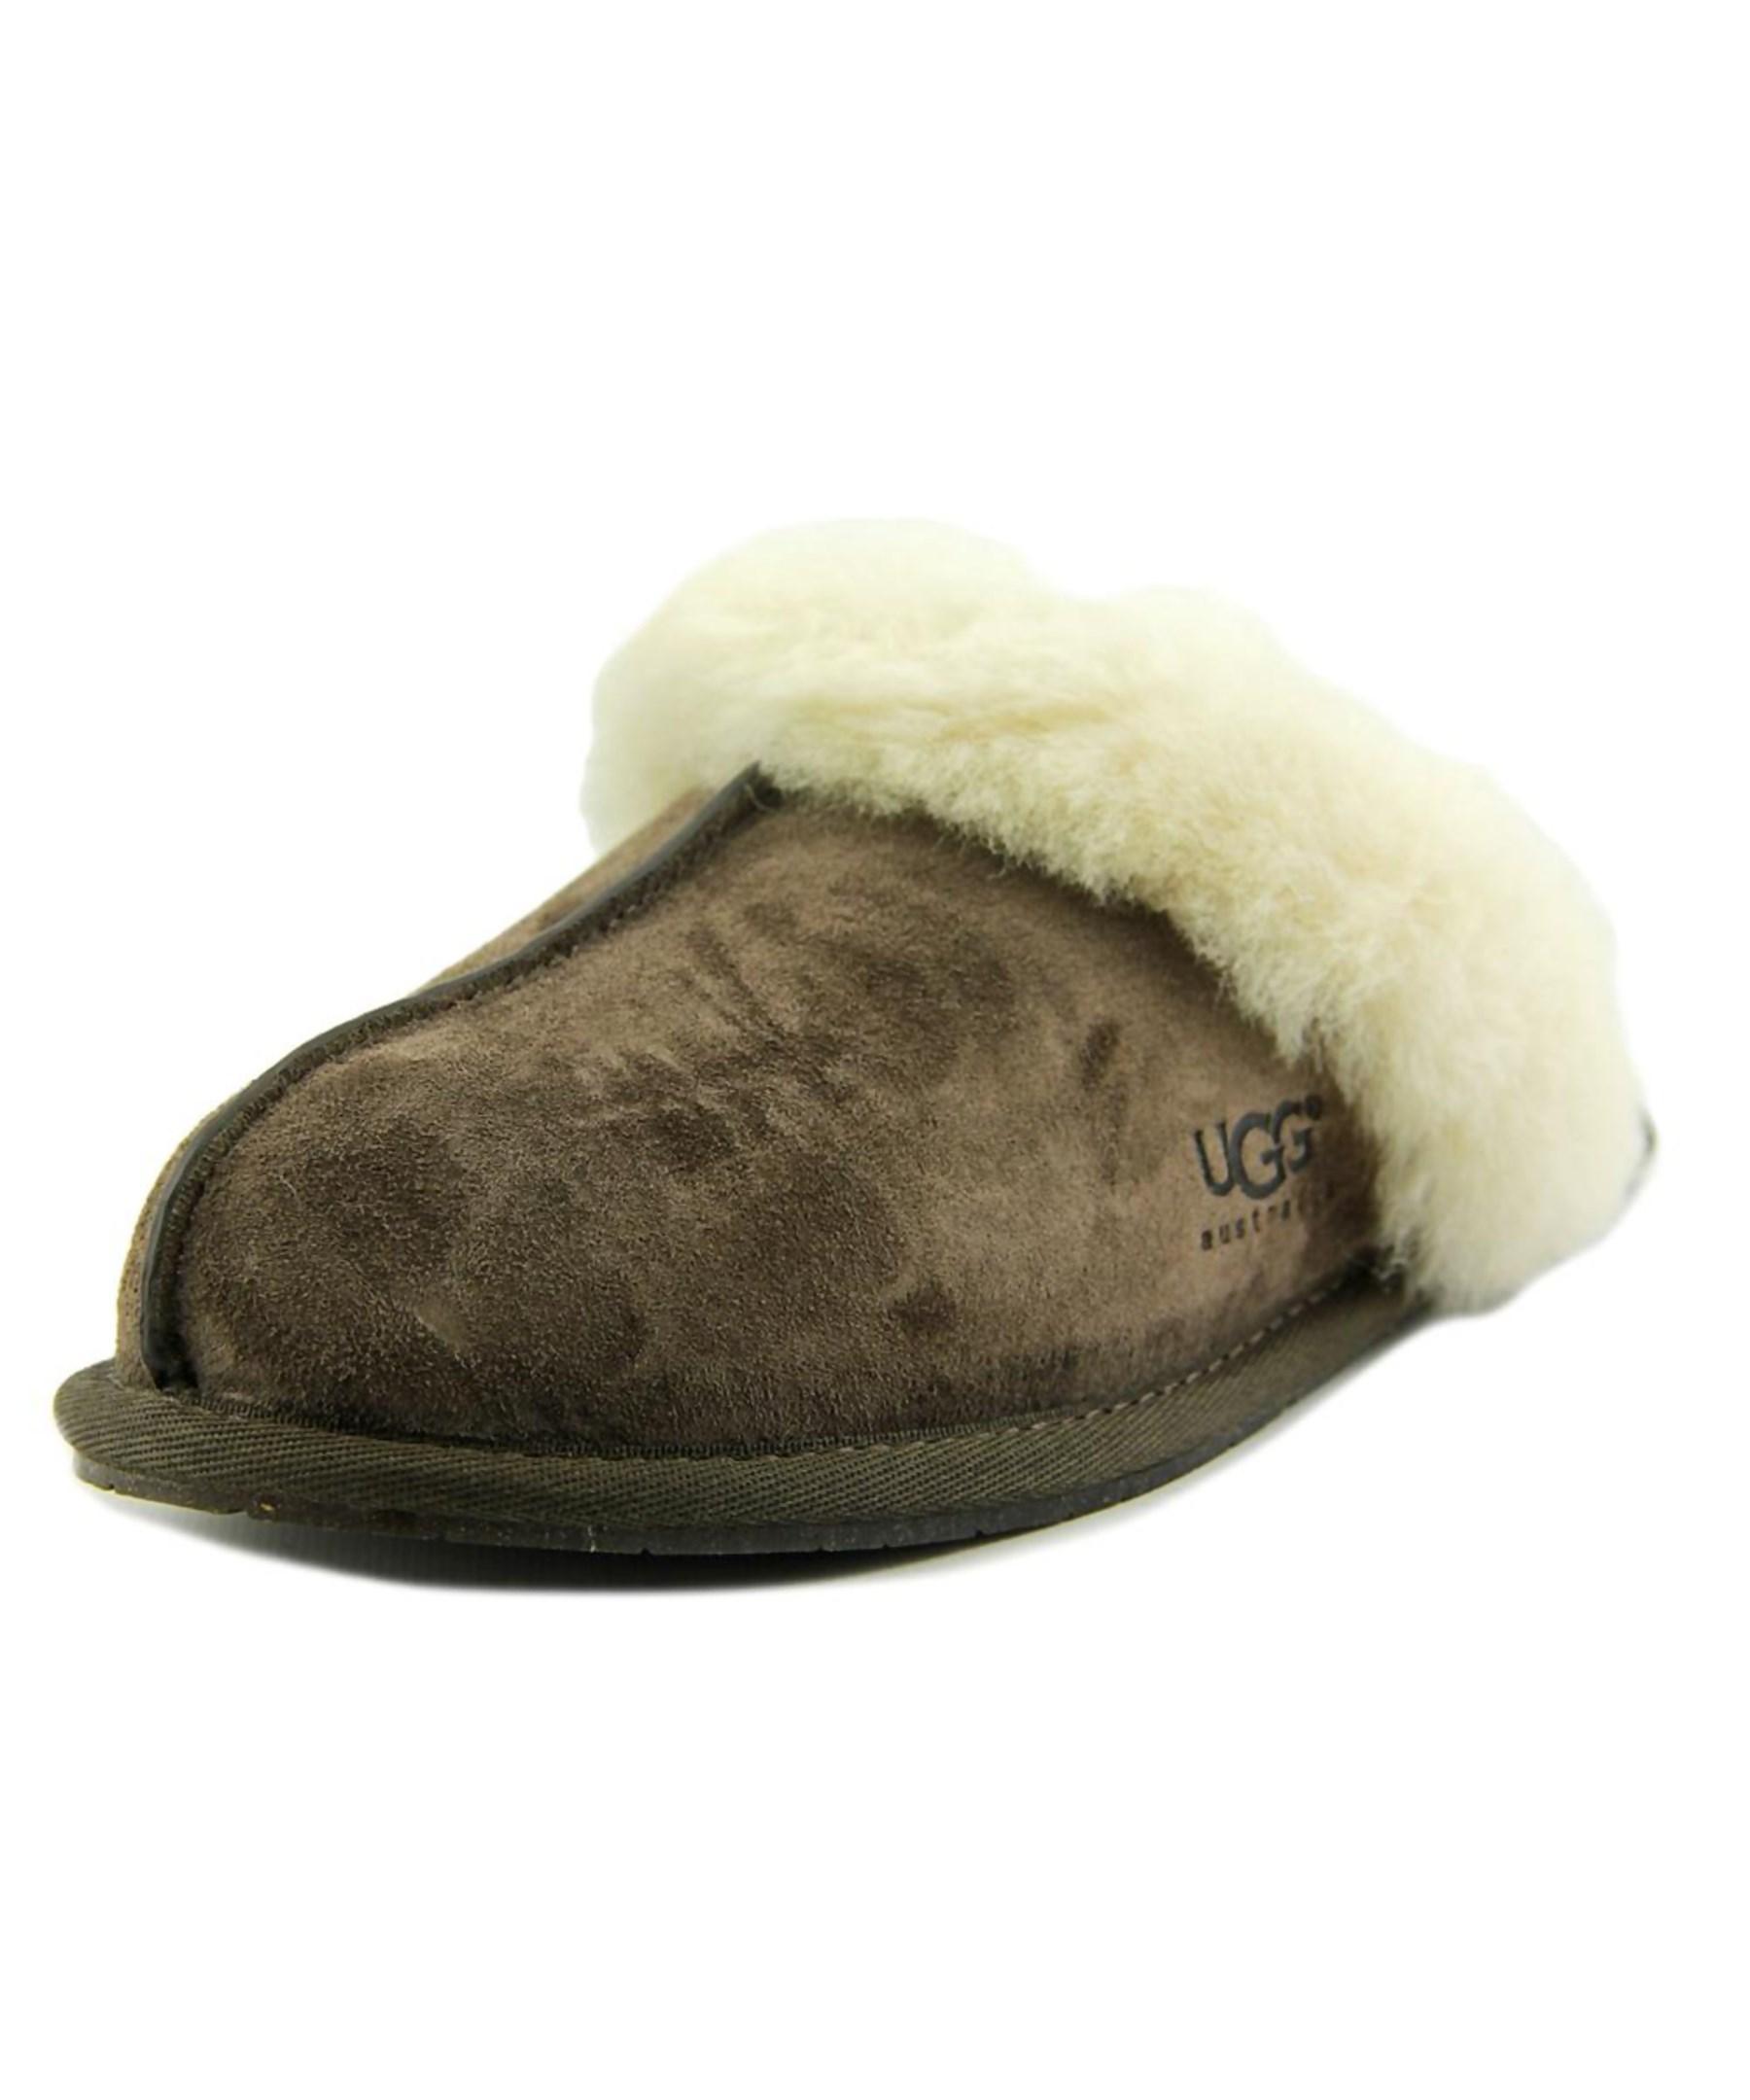 ugg slippers cheapest